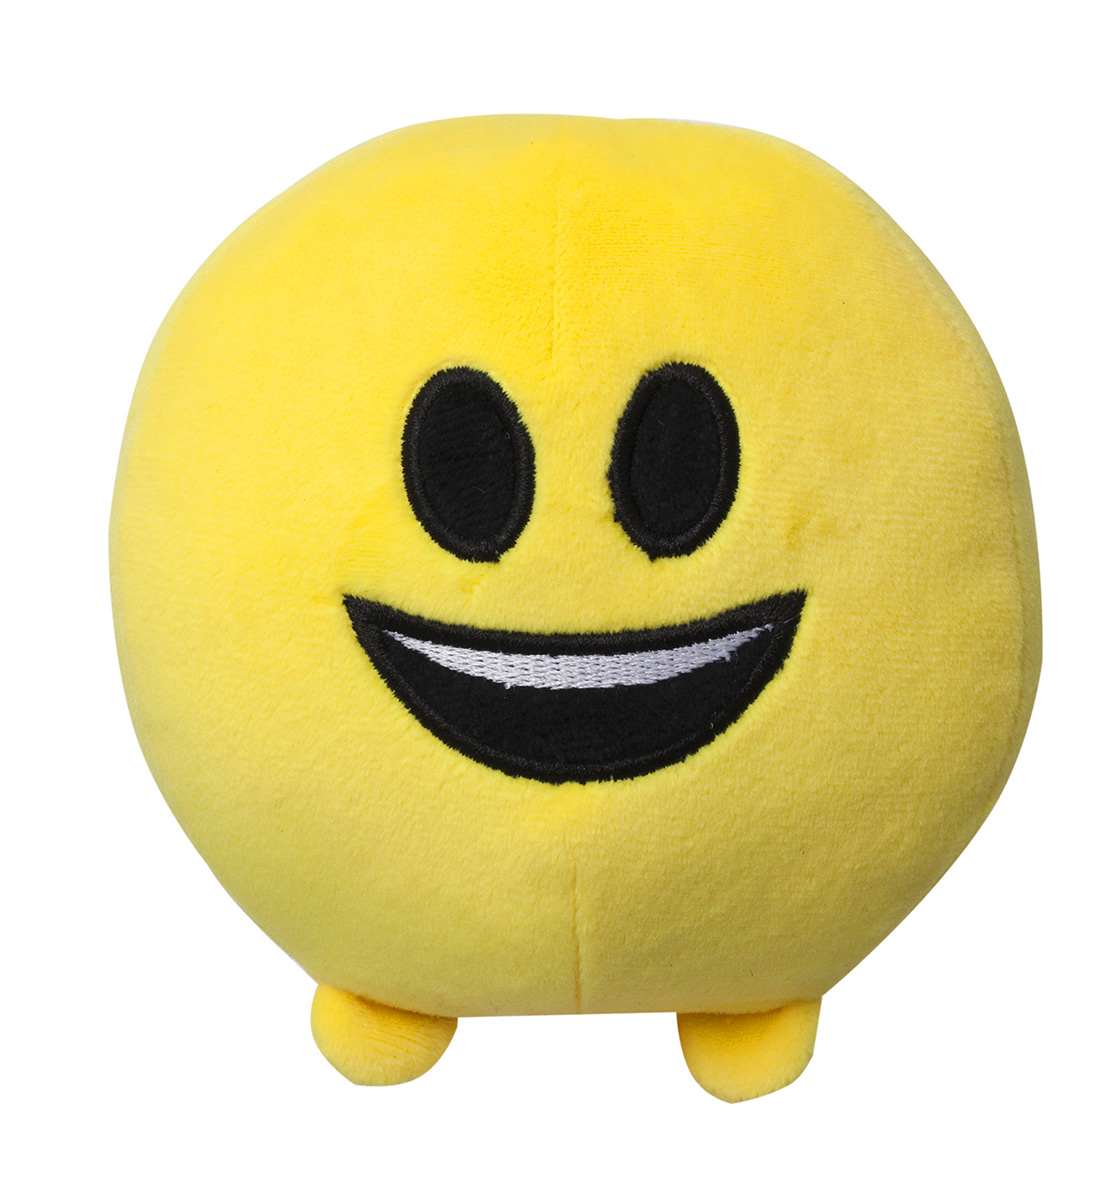 Imoji Мягкая игрушка 12 см 40050 imoji мягкая игрушка 12 см 41059